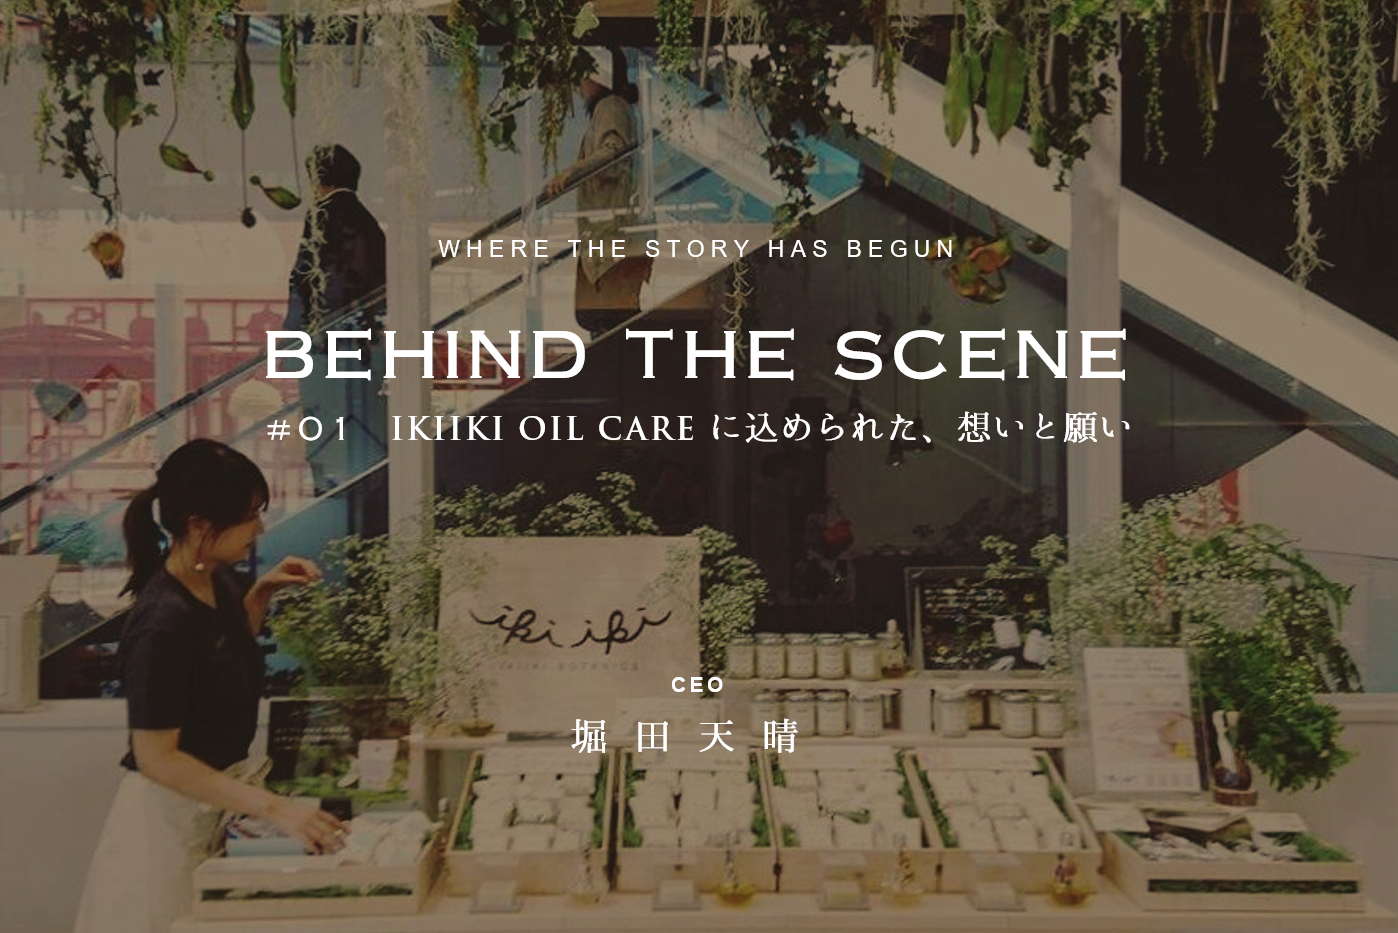 Behind the Scene #01 「IKIIKI OIL CAREに込められた、想いと願い」from TEN